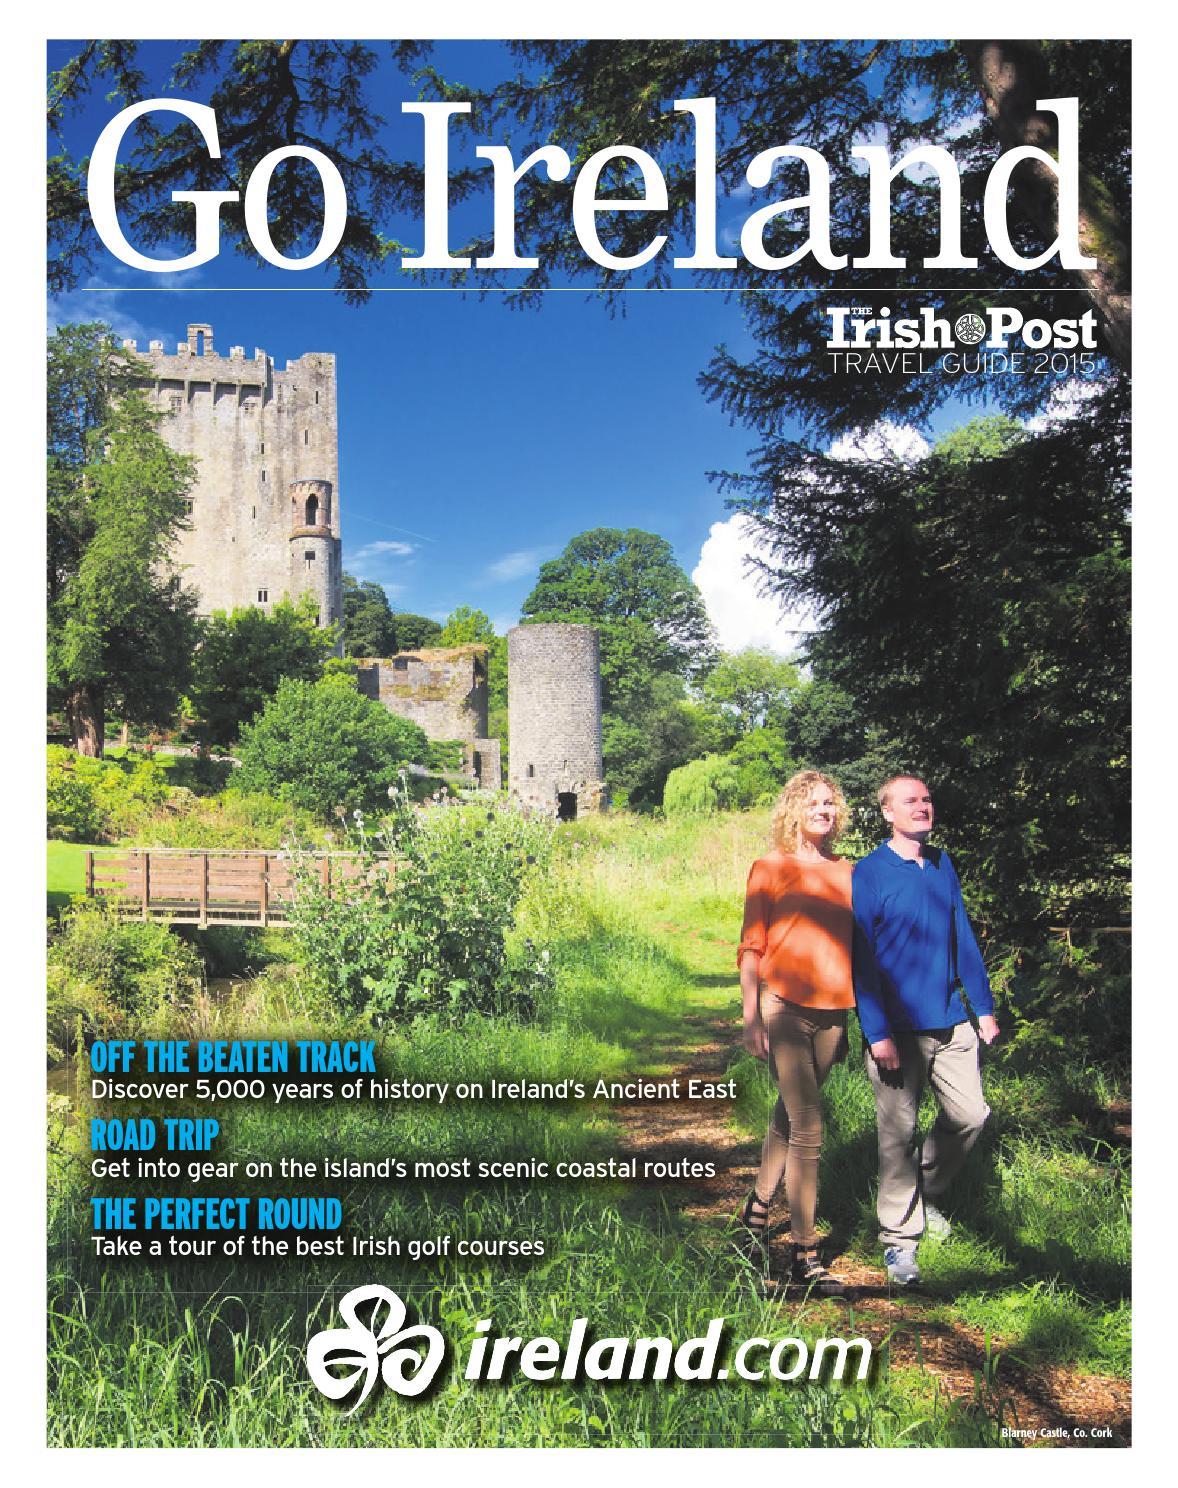 SLIGO IRELAND IRISH CELTIC T-SHIRT Silkscreen